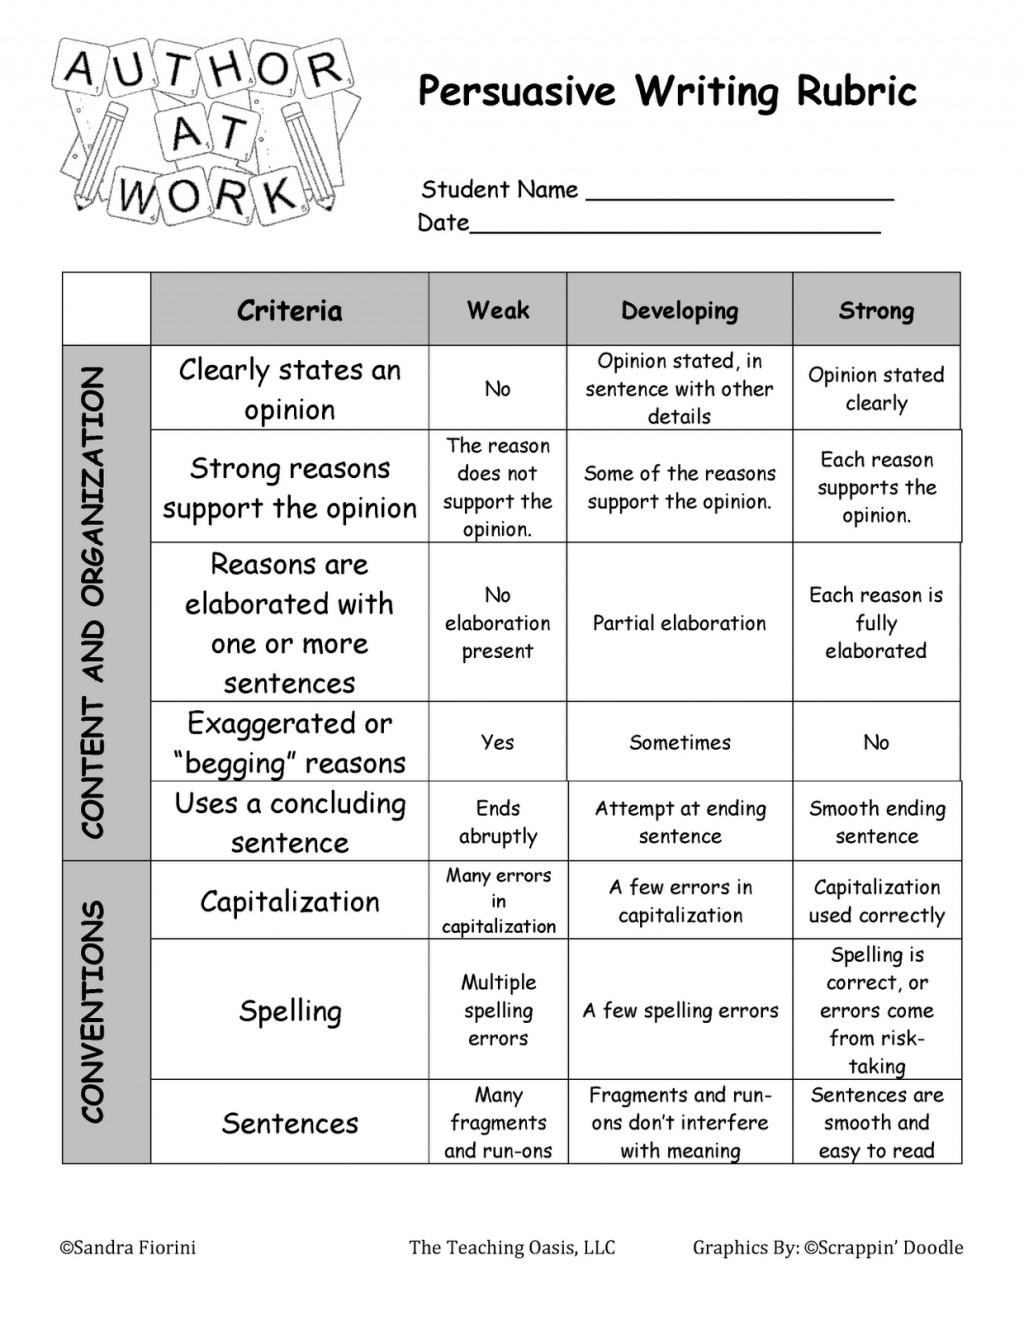 003 Essay Example Persuasive Rubric Stunning Argumentative Grade 10 8th Doc Middle School Pdf Large